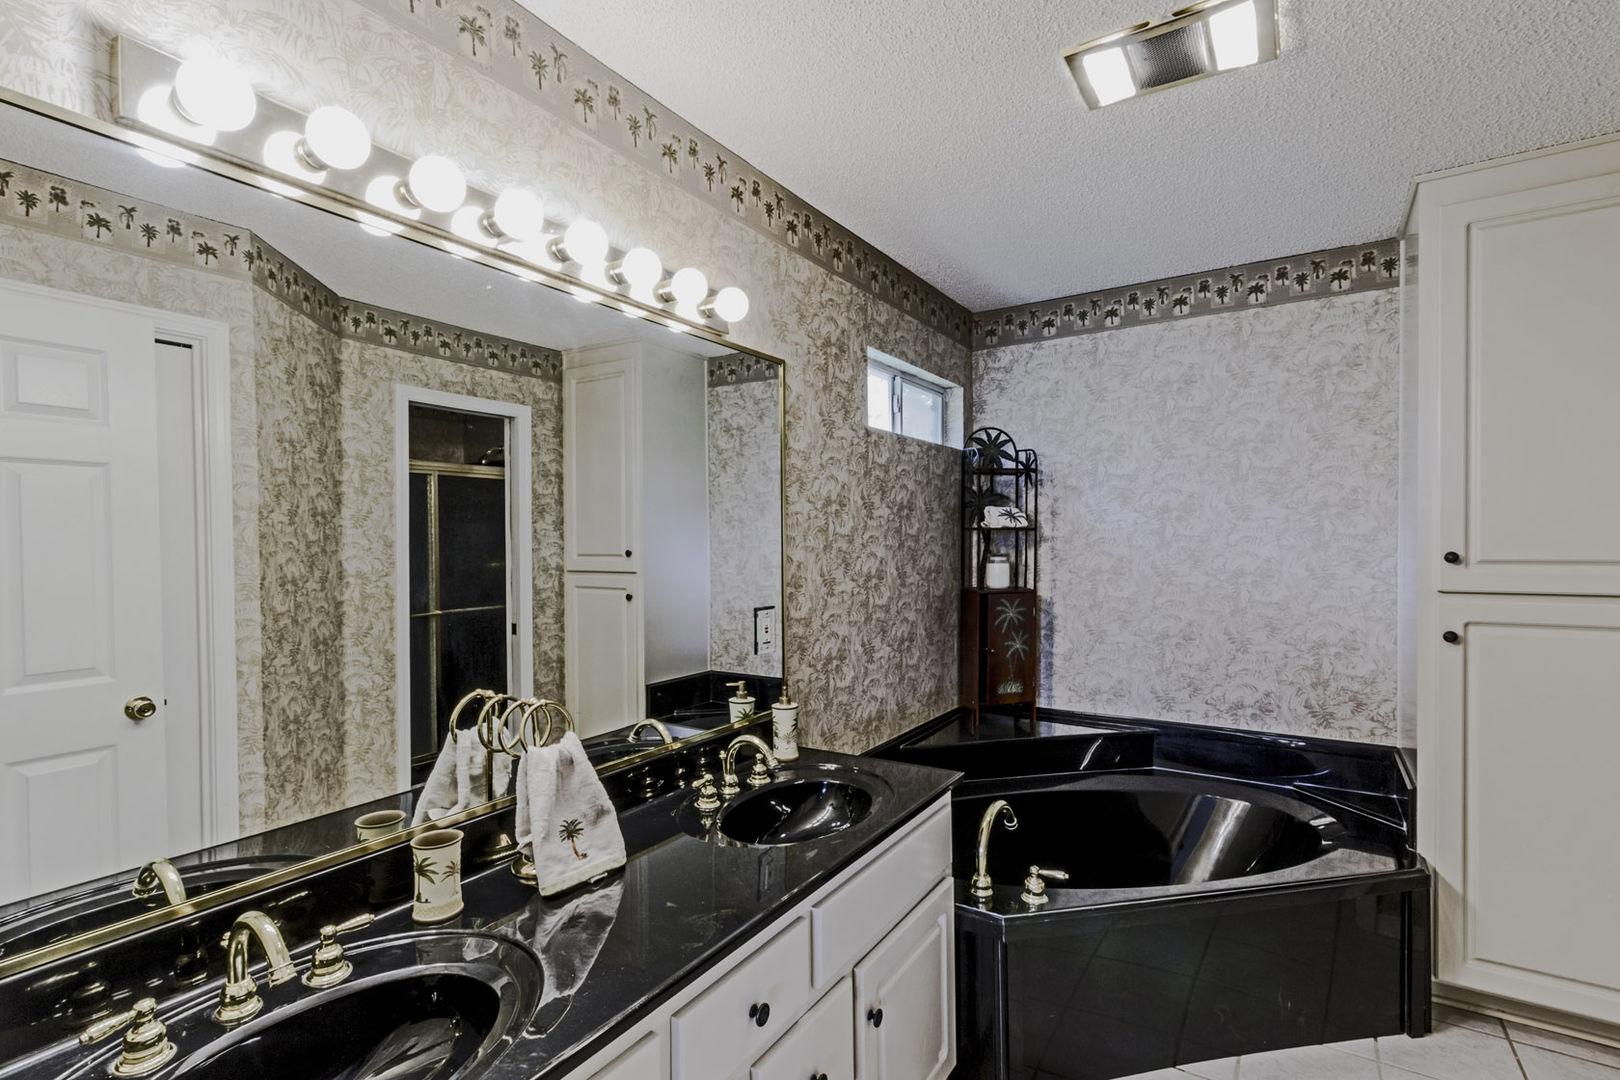 Master Bathroom with vanity sink and large tub.